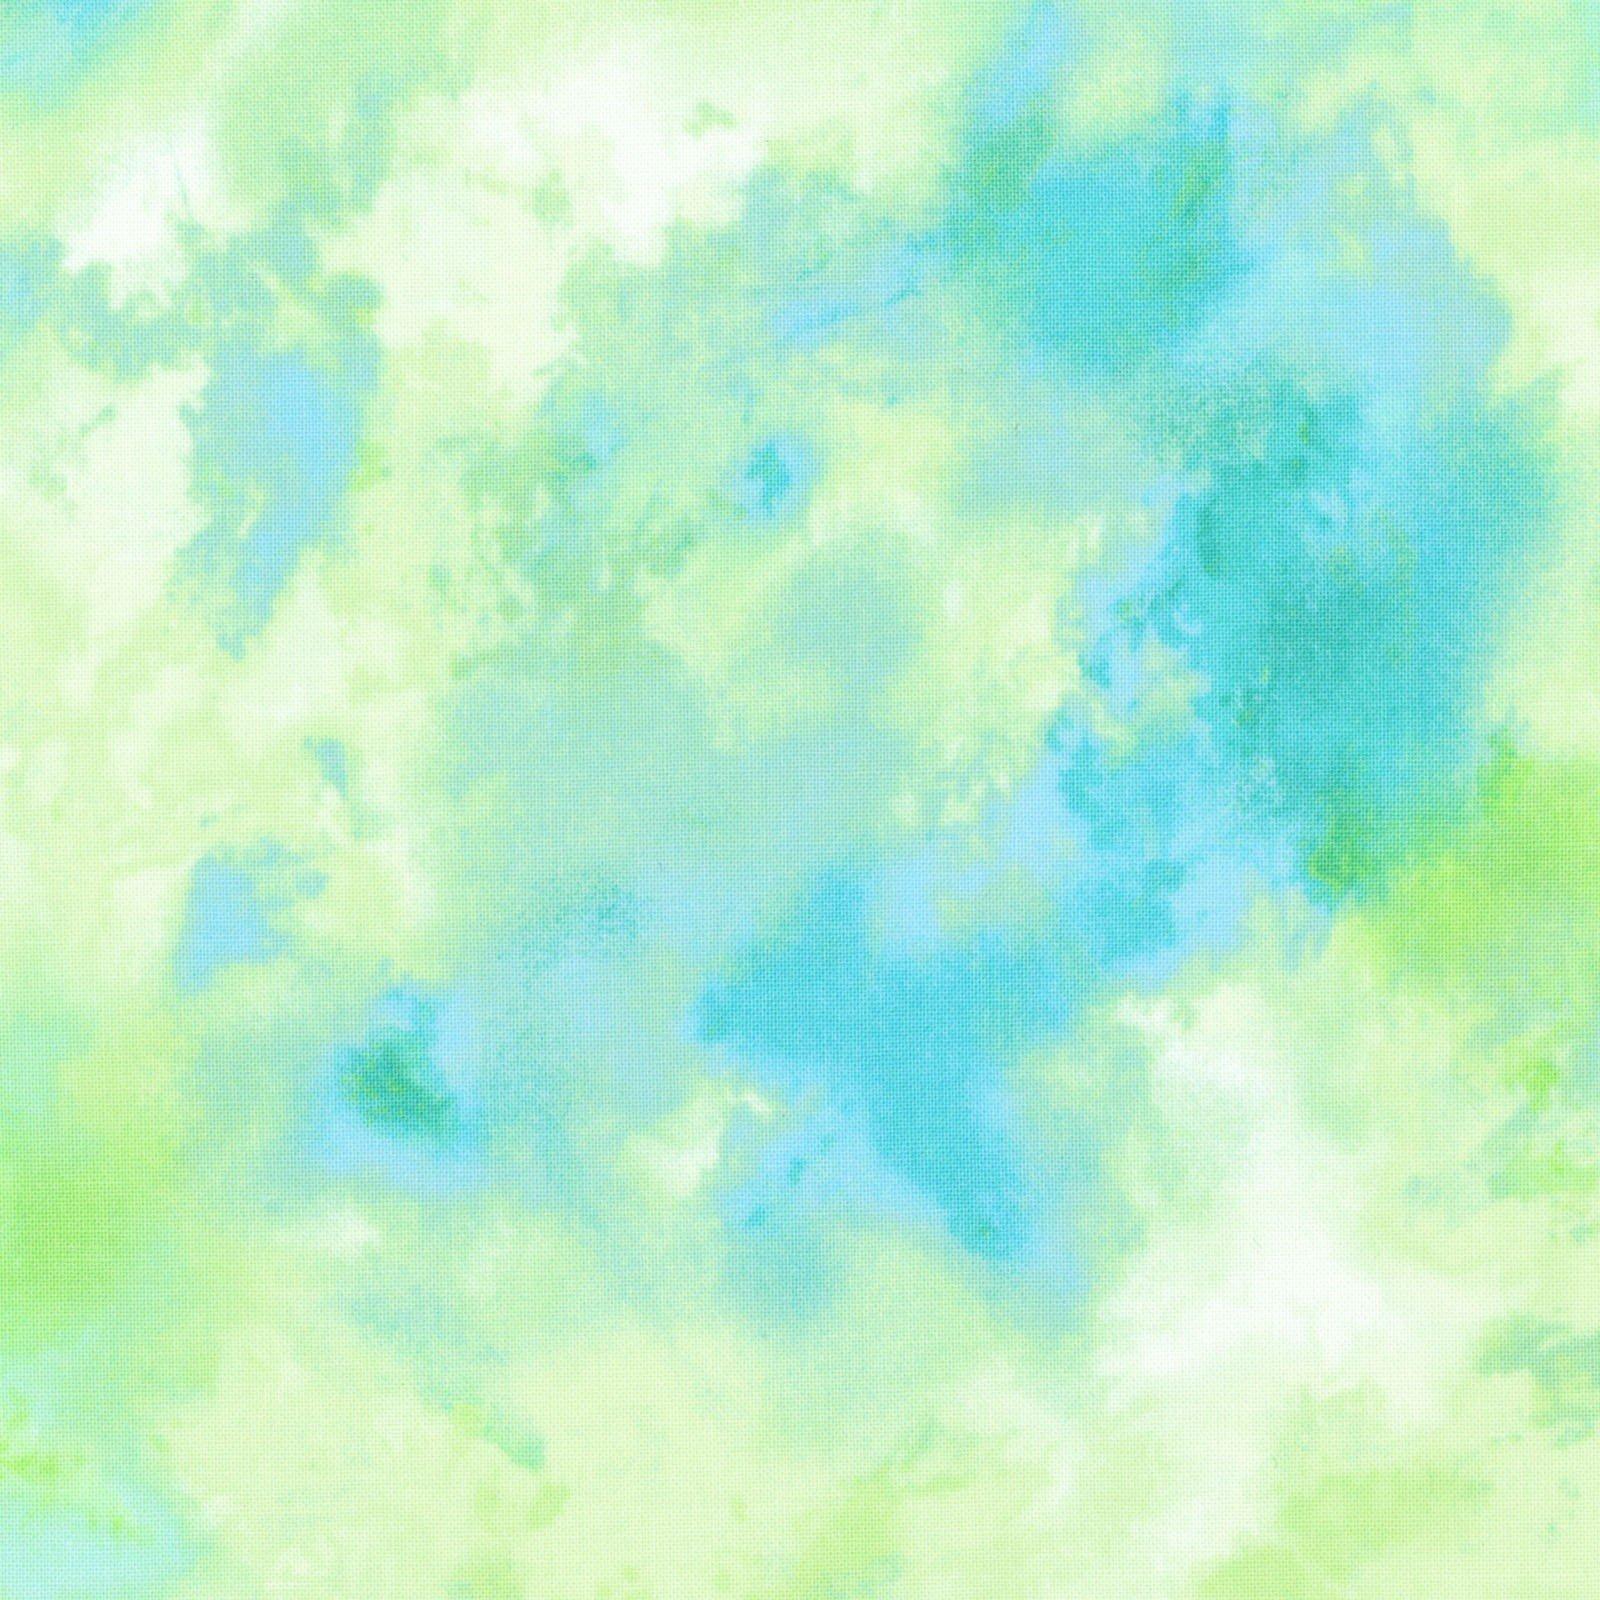 Lt Green Blue - Sunny Splash - Lucien - LEC6100-60